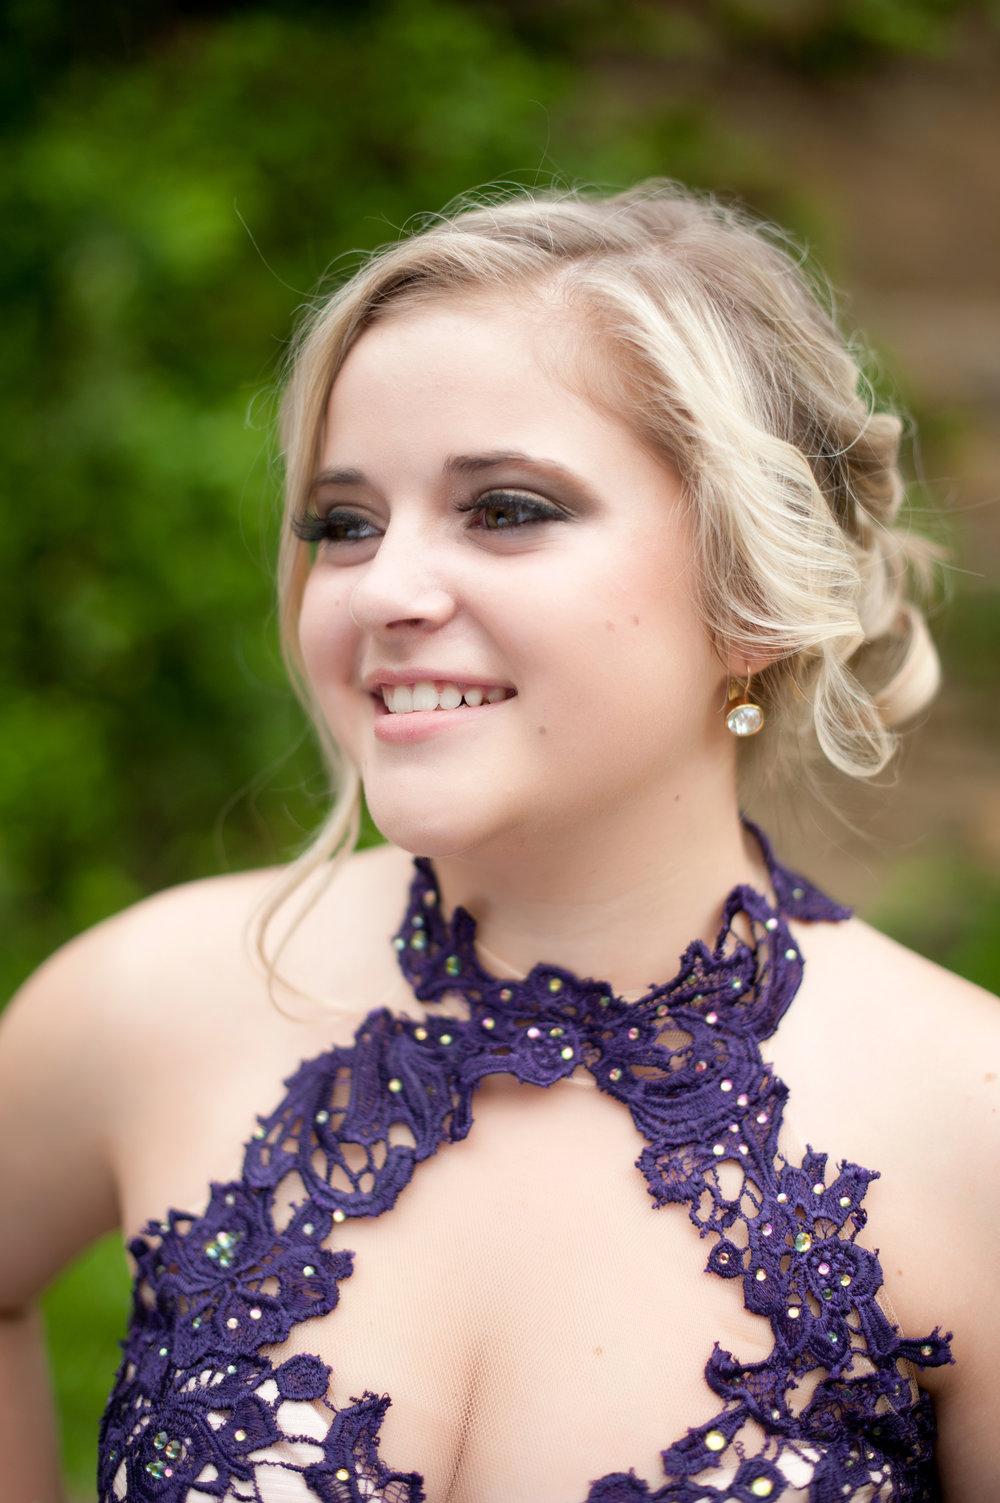 causby prom 0418 2015-12.jpg